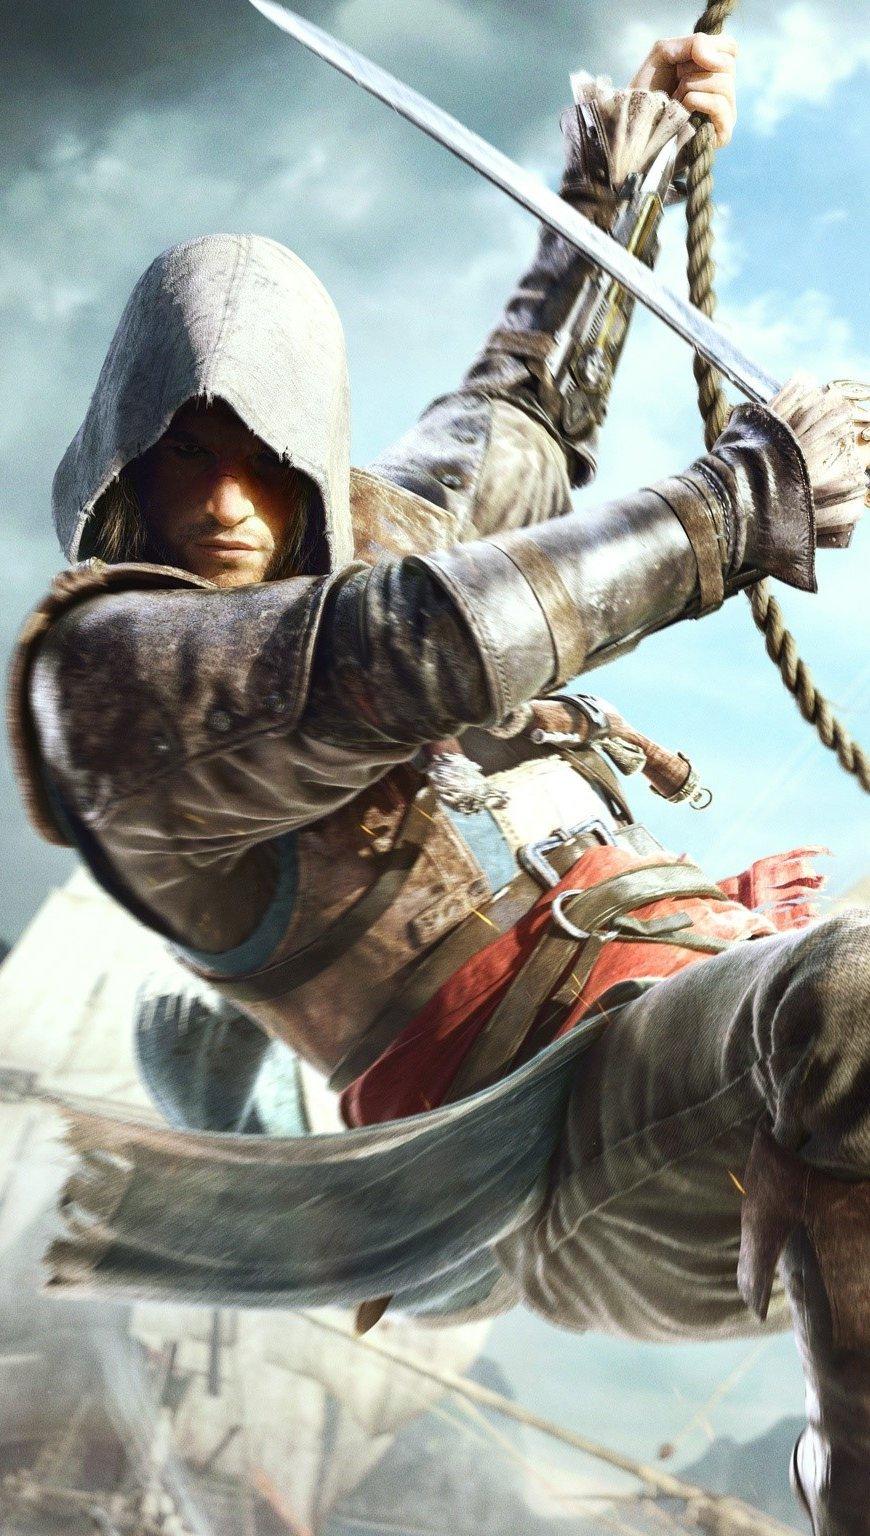 Fondos de pantalla Edward kenway en Assassins Creed 4 Vertical